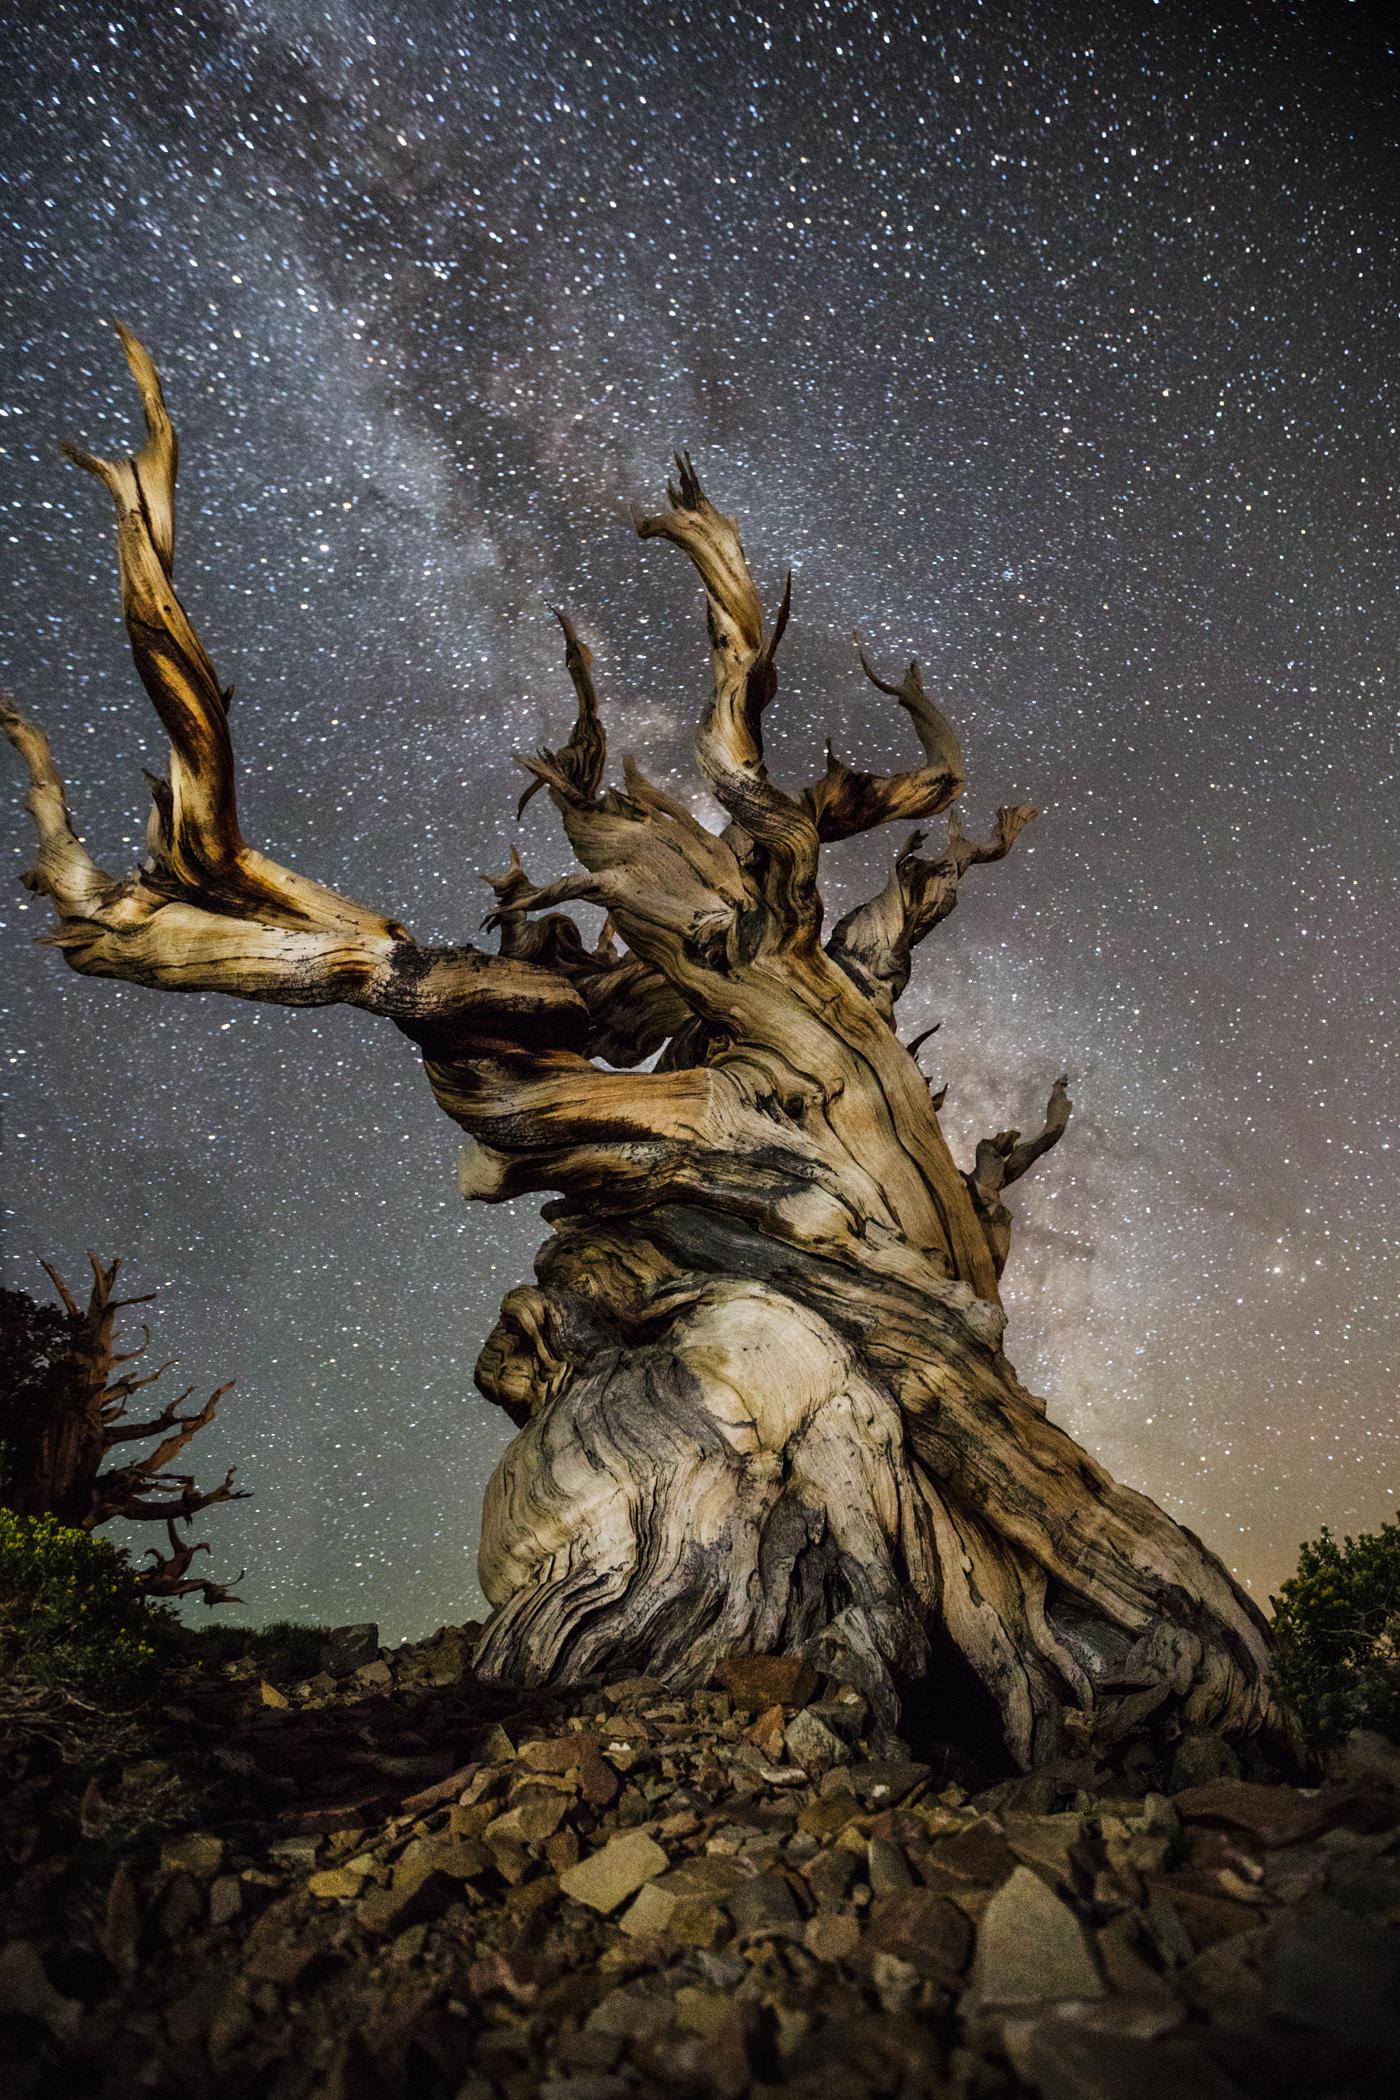 beth-moon-vieu-arbre-etoile-02